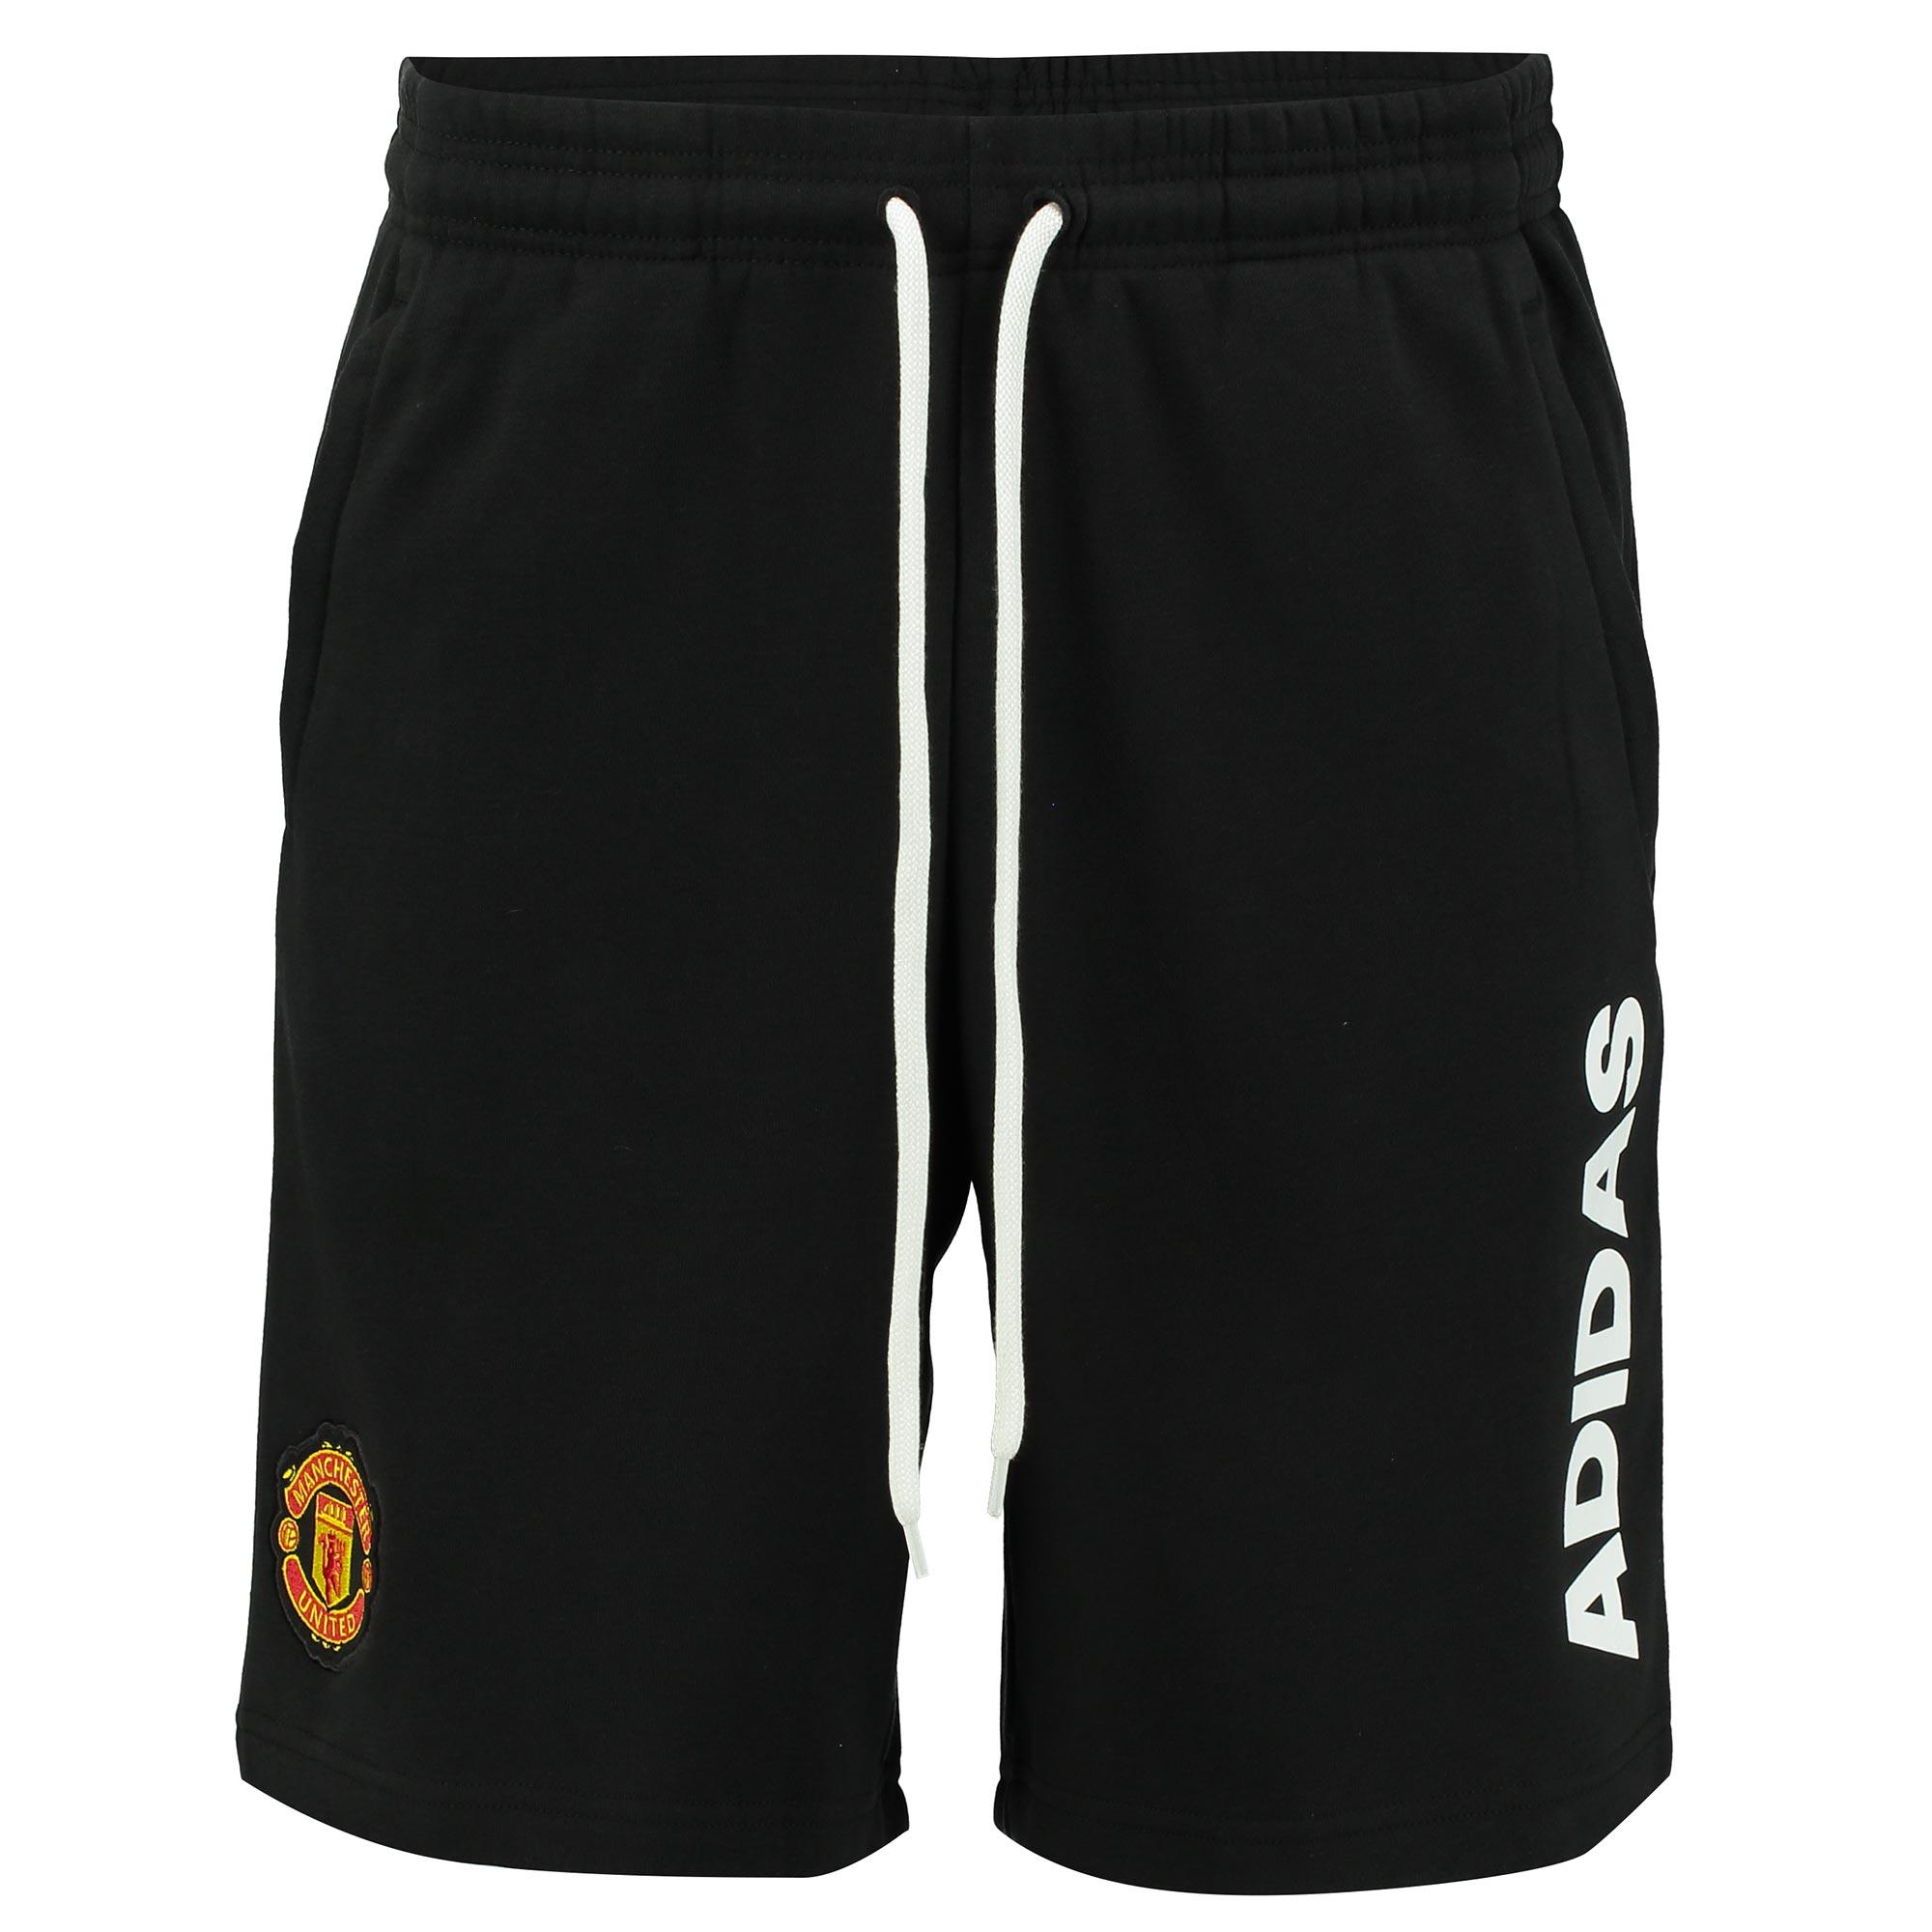 Manchester United Linear Short - Black